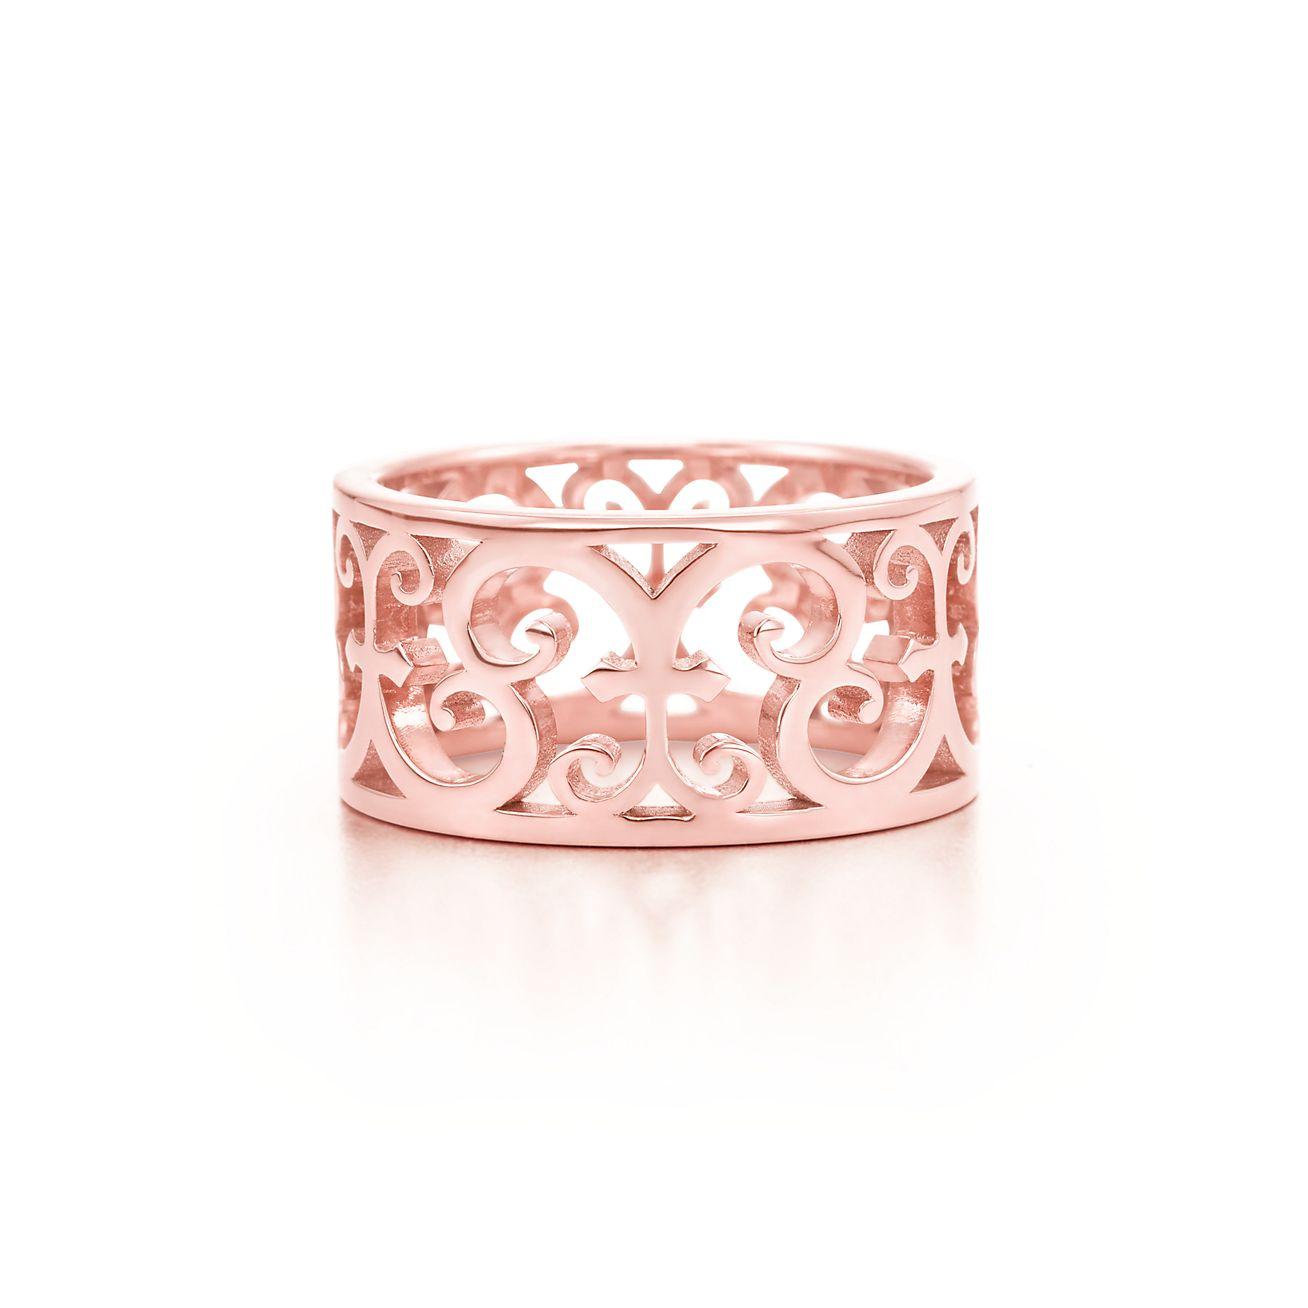 Tiffany Enchant® wide ring in Rubedo® metal. | Tiffany & Co.